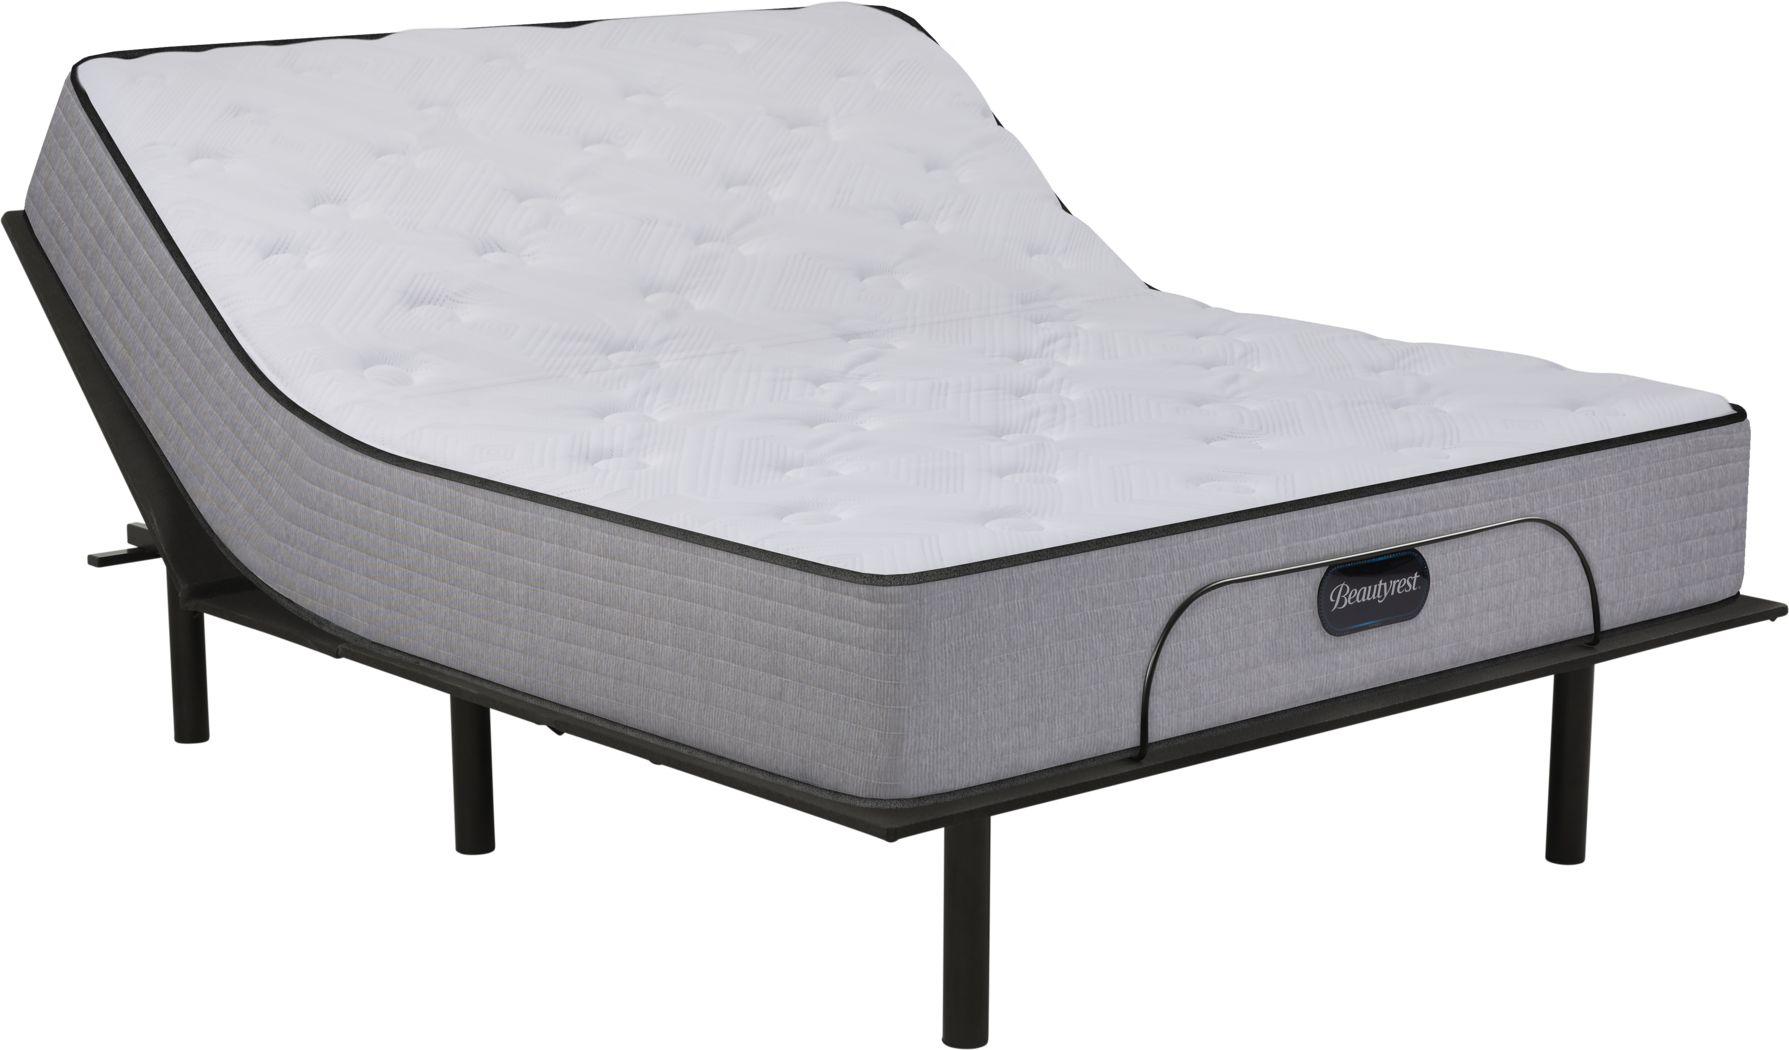 Beautyrest Bristol Hills King Mattress with RTG Sleep 2000 Adjustable Base